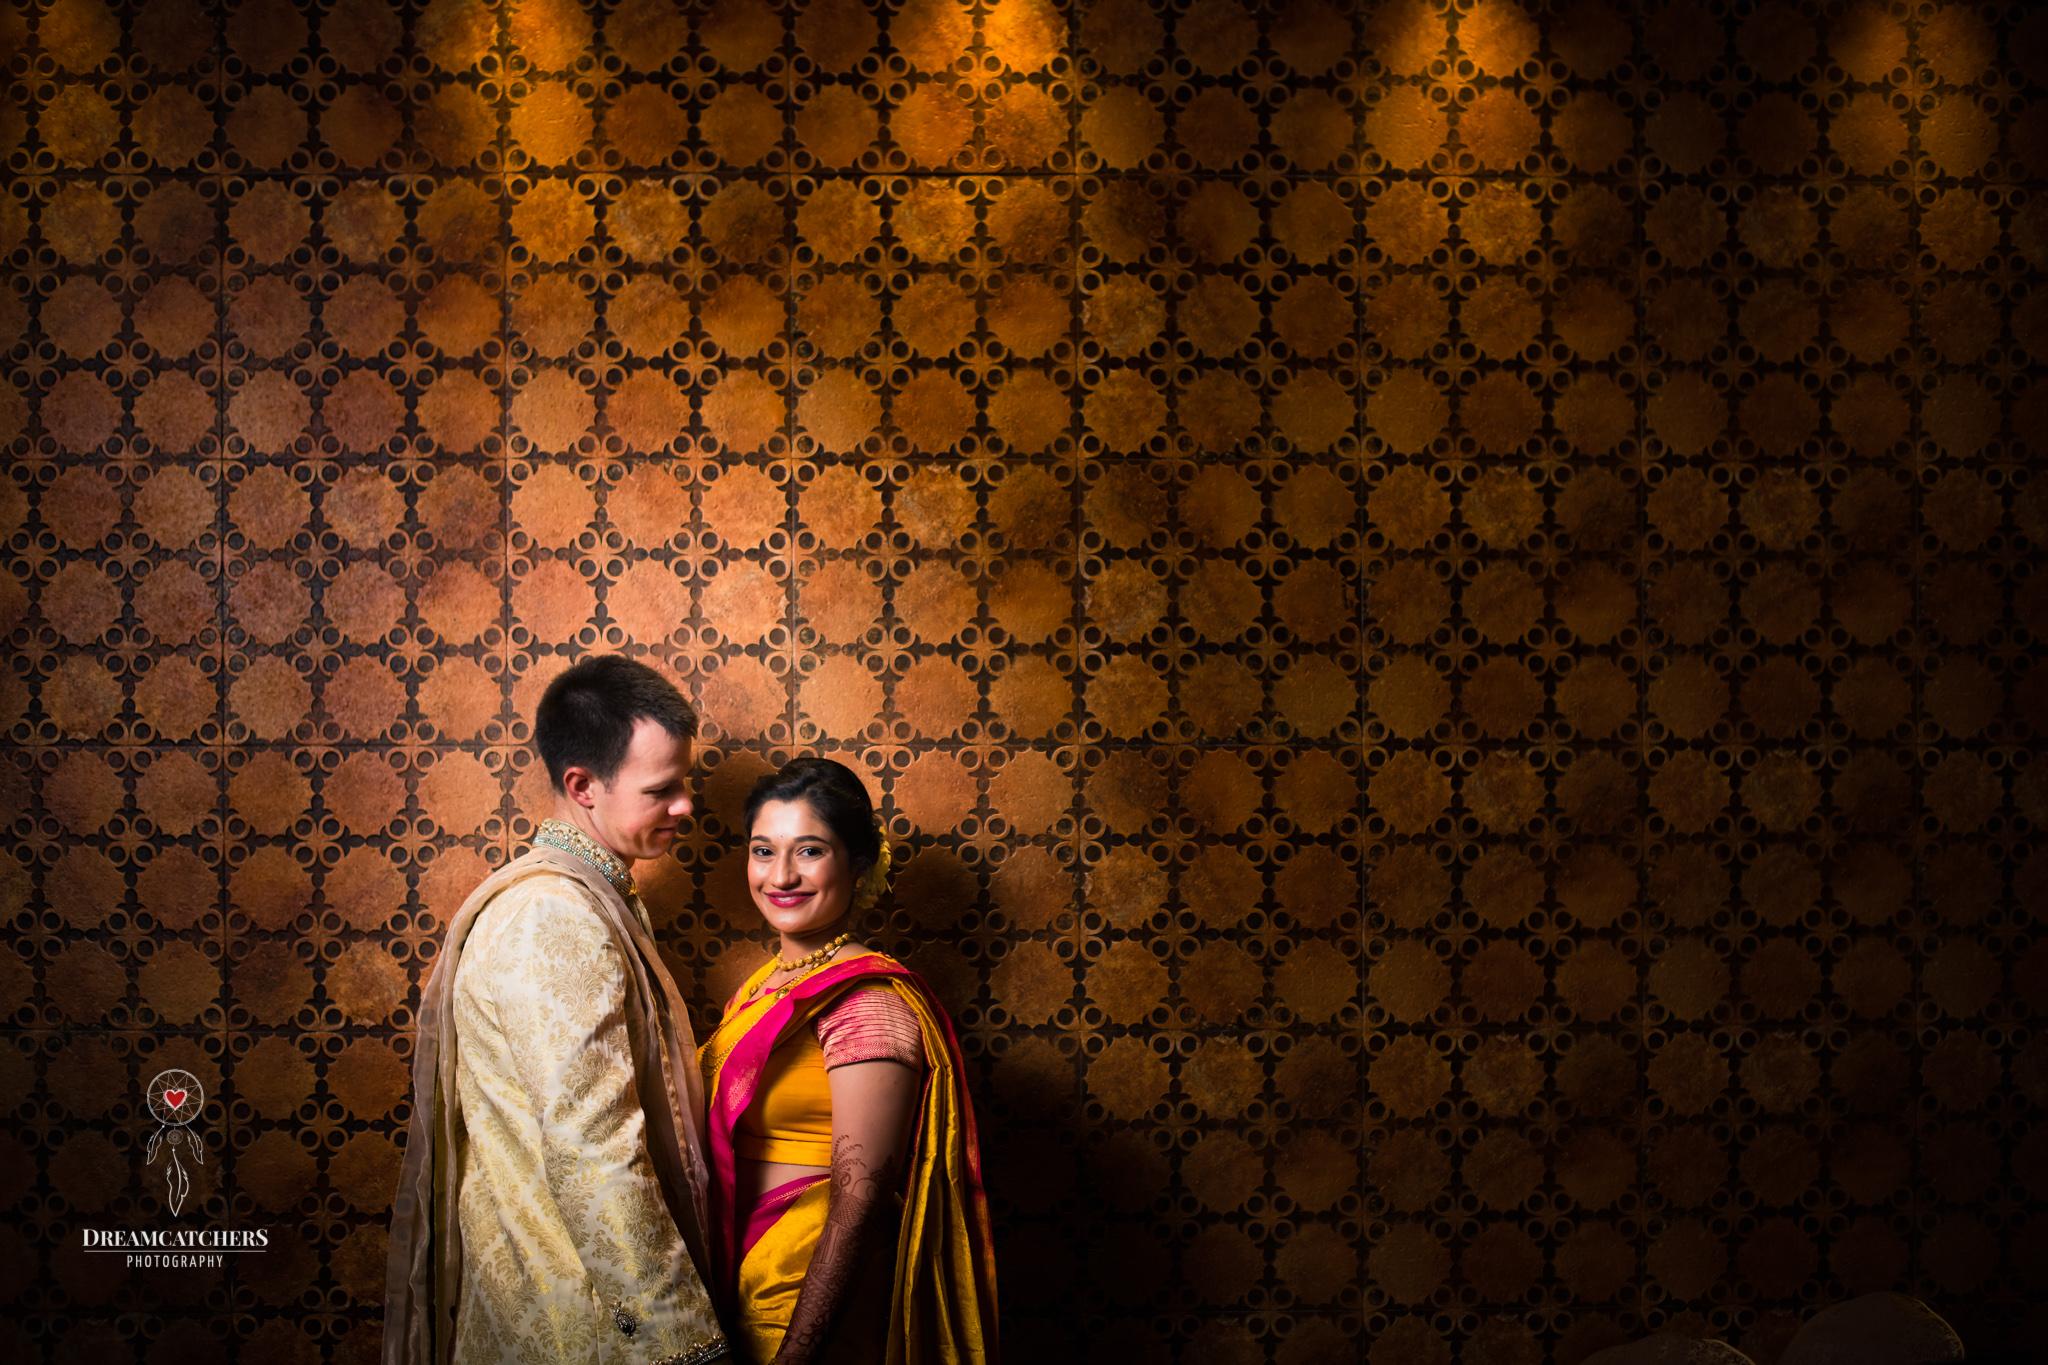 Tanvi+Steven_Wedding_Dreamcatchers Photography-70.JPG